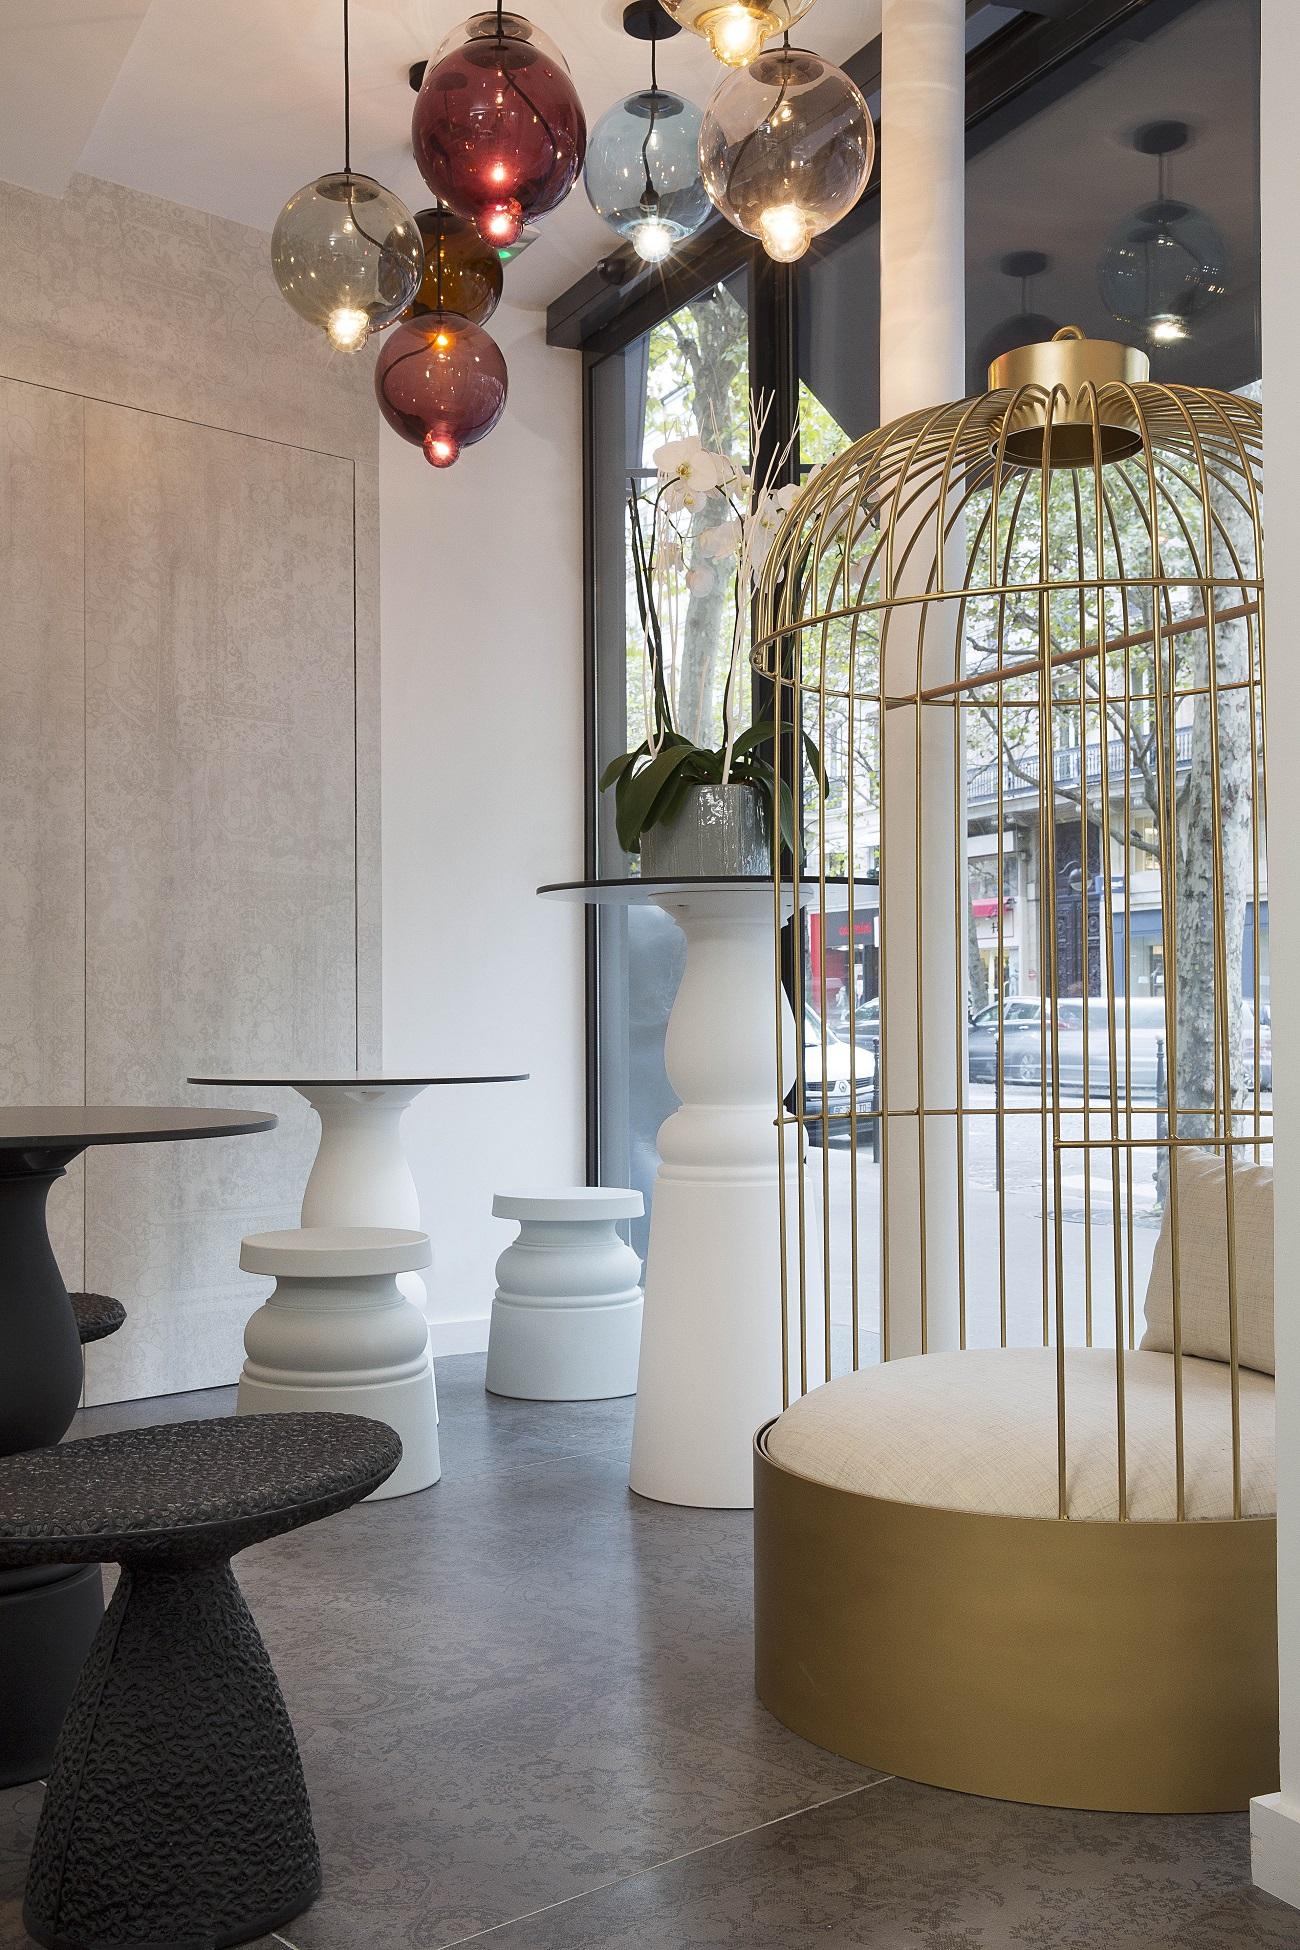 Cage_design-Anoushka-Potdevin-_LOBBY-HOTEL-CHAVANEL-